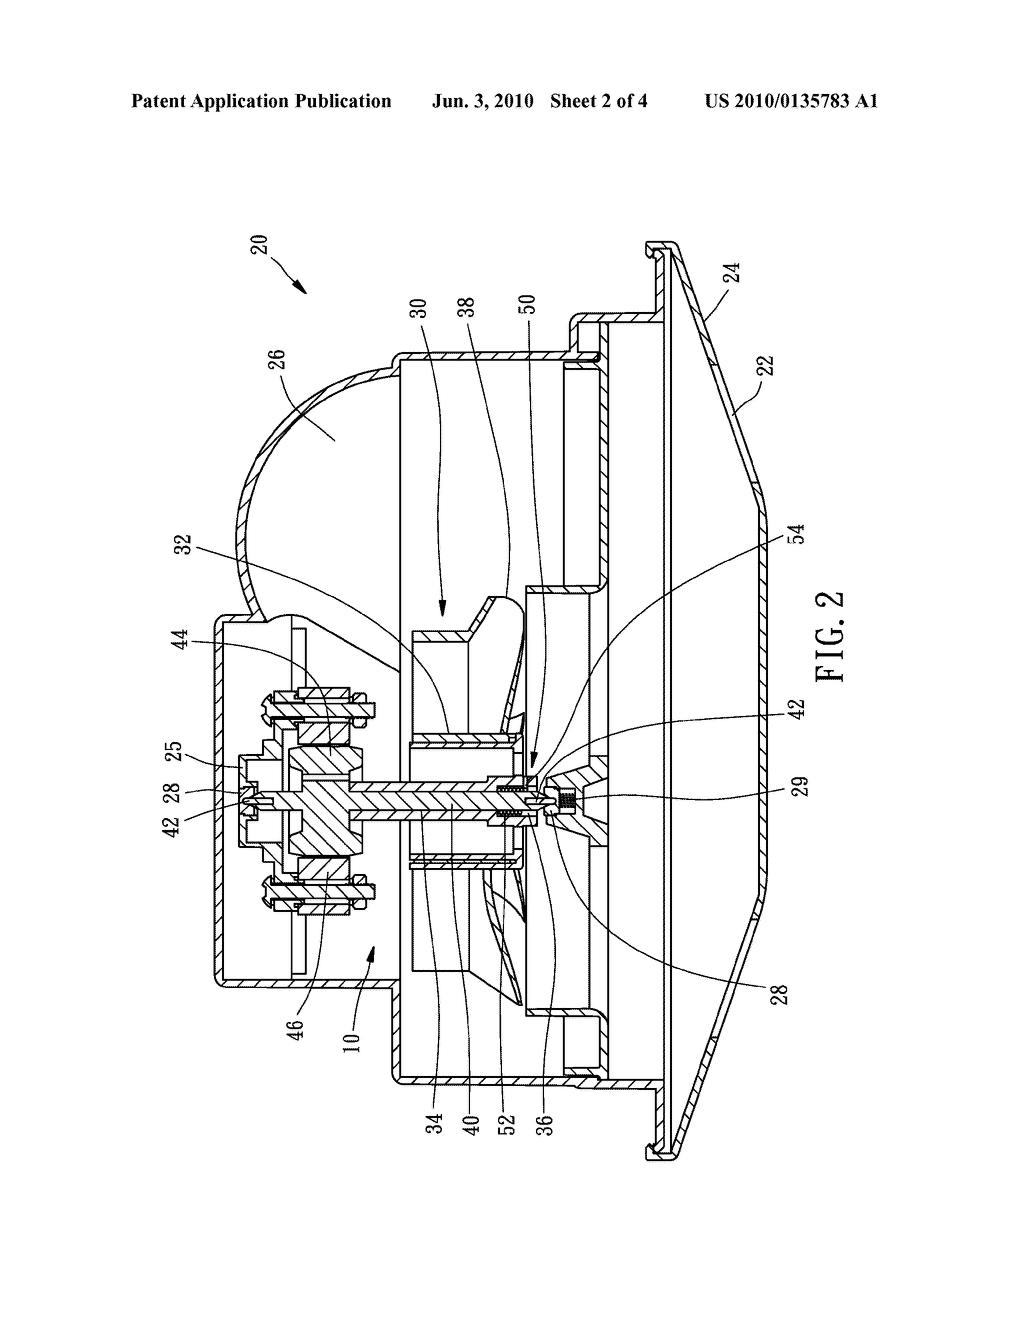 Wrg Bathroom Exhaust Fan Wiring Diagrams